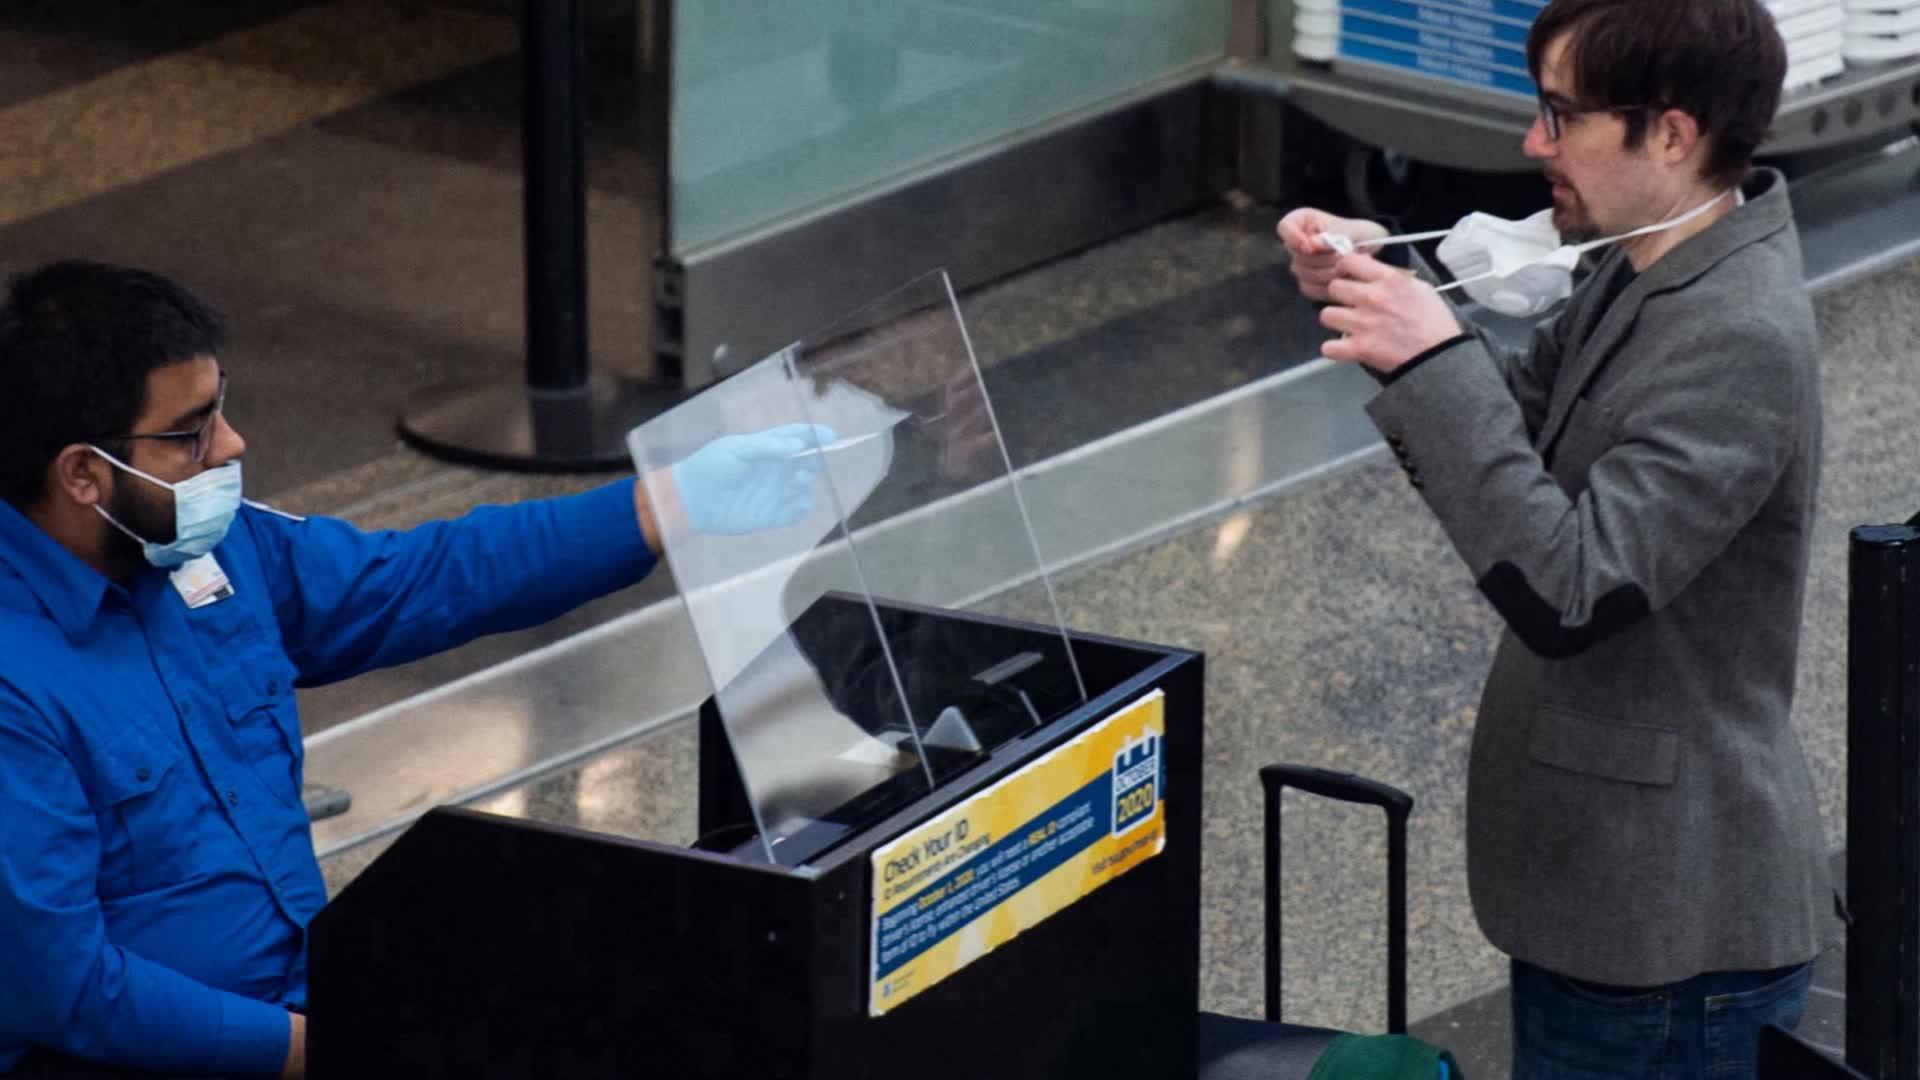 TSA implements changes amid pandemic following whistleblower complaint